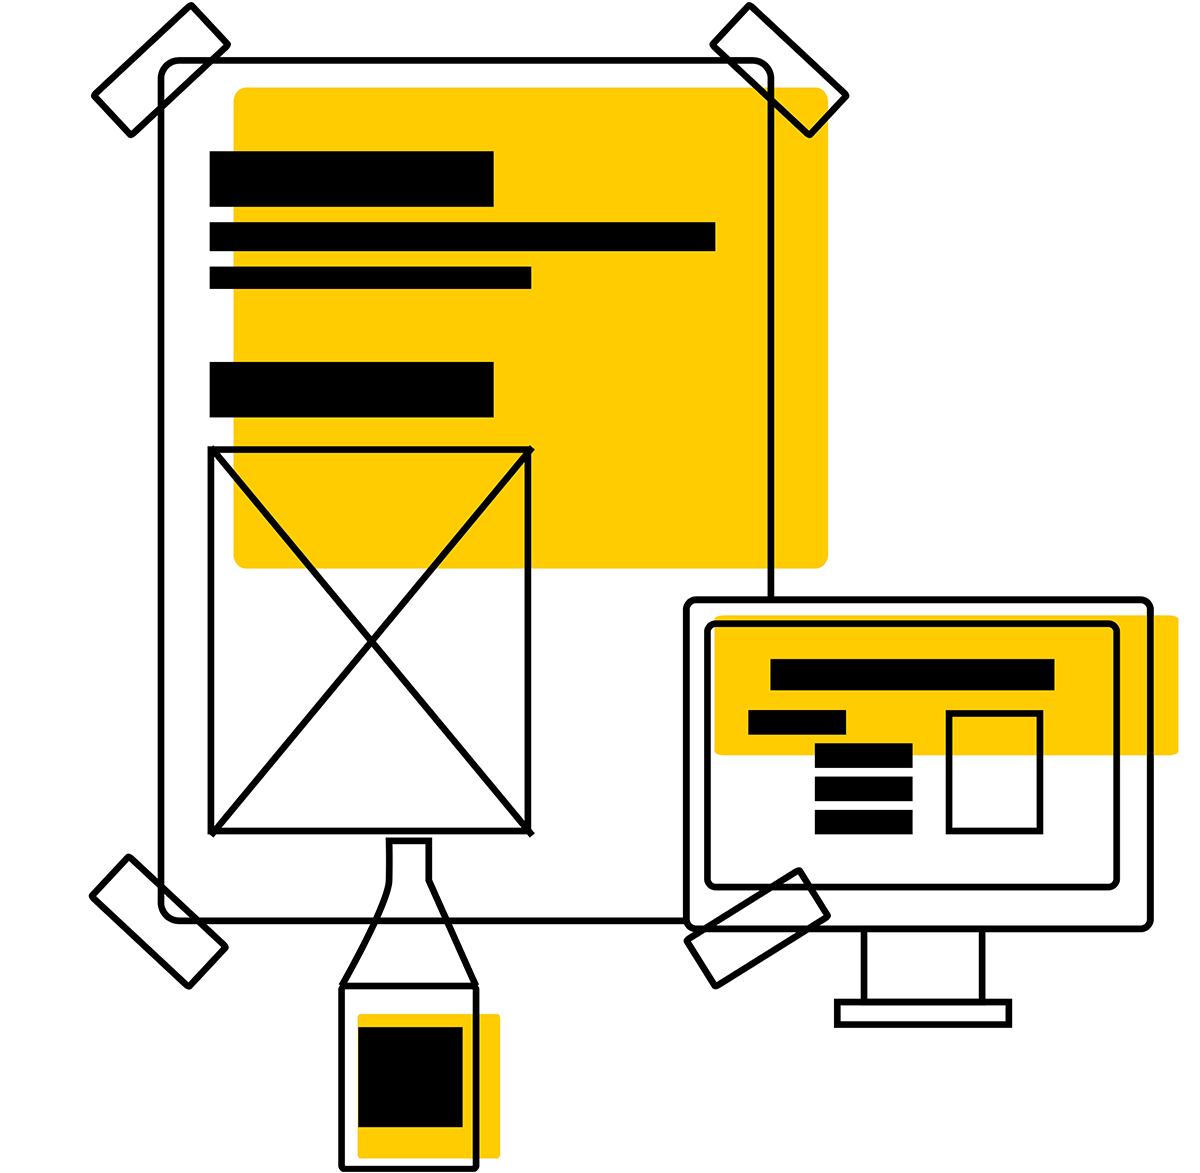 design gráfico O estúdio de design gráfico - logotipo - Webdesign